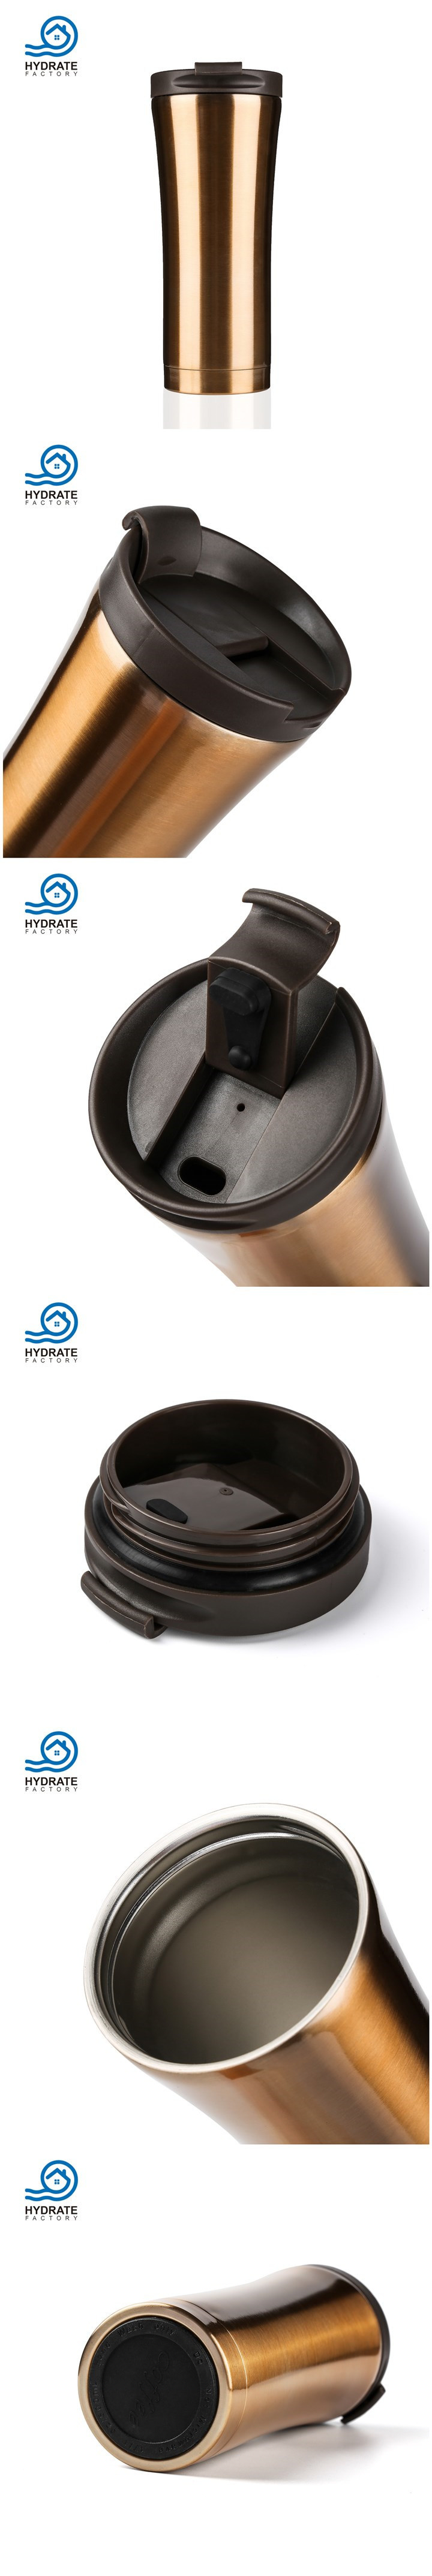 Office Commerce Stainless Steel 18/8 Vacuum Insulation Coffee Mug